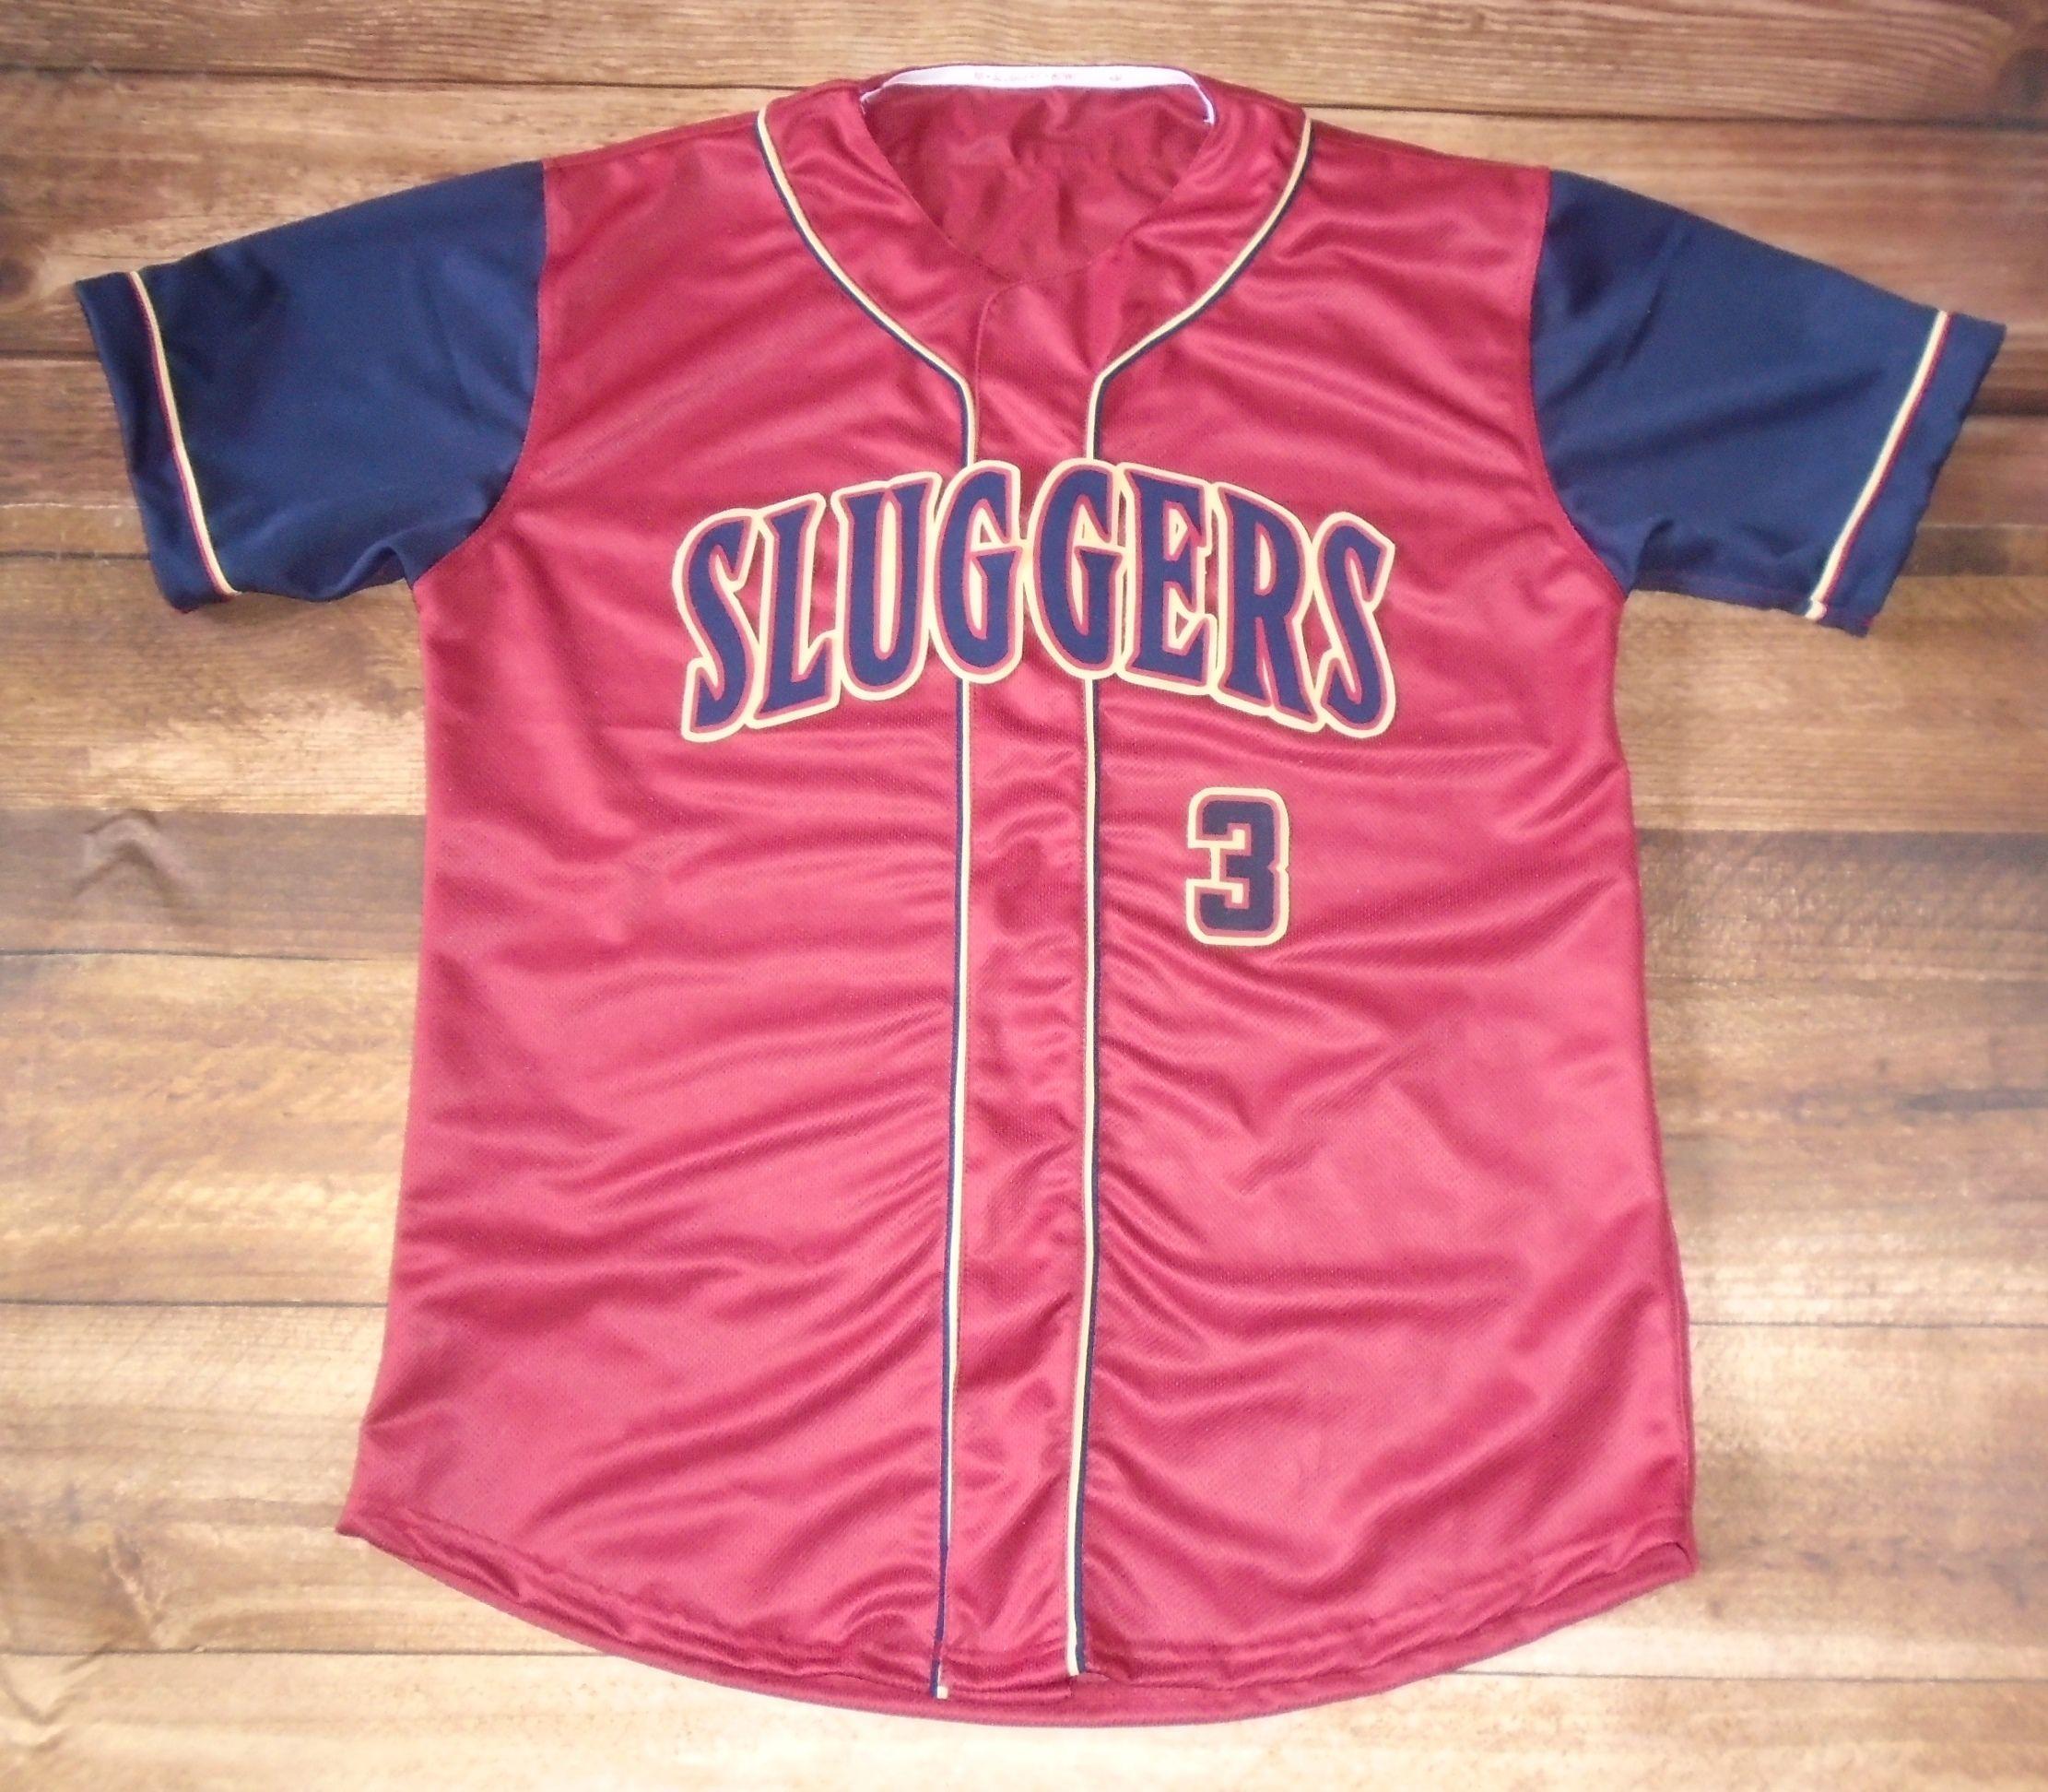 Herriman Sluggers Baseball Custom Jersey Created At Universal Athletic Salt Lake City Create Your Own Custom Uniforms At In 2020 Custom Uniform Custom Jerseys Jersey